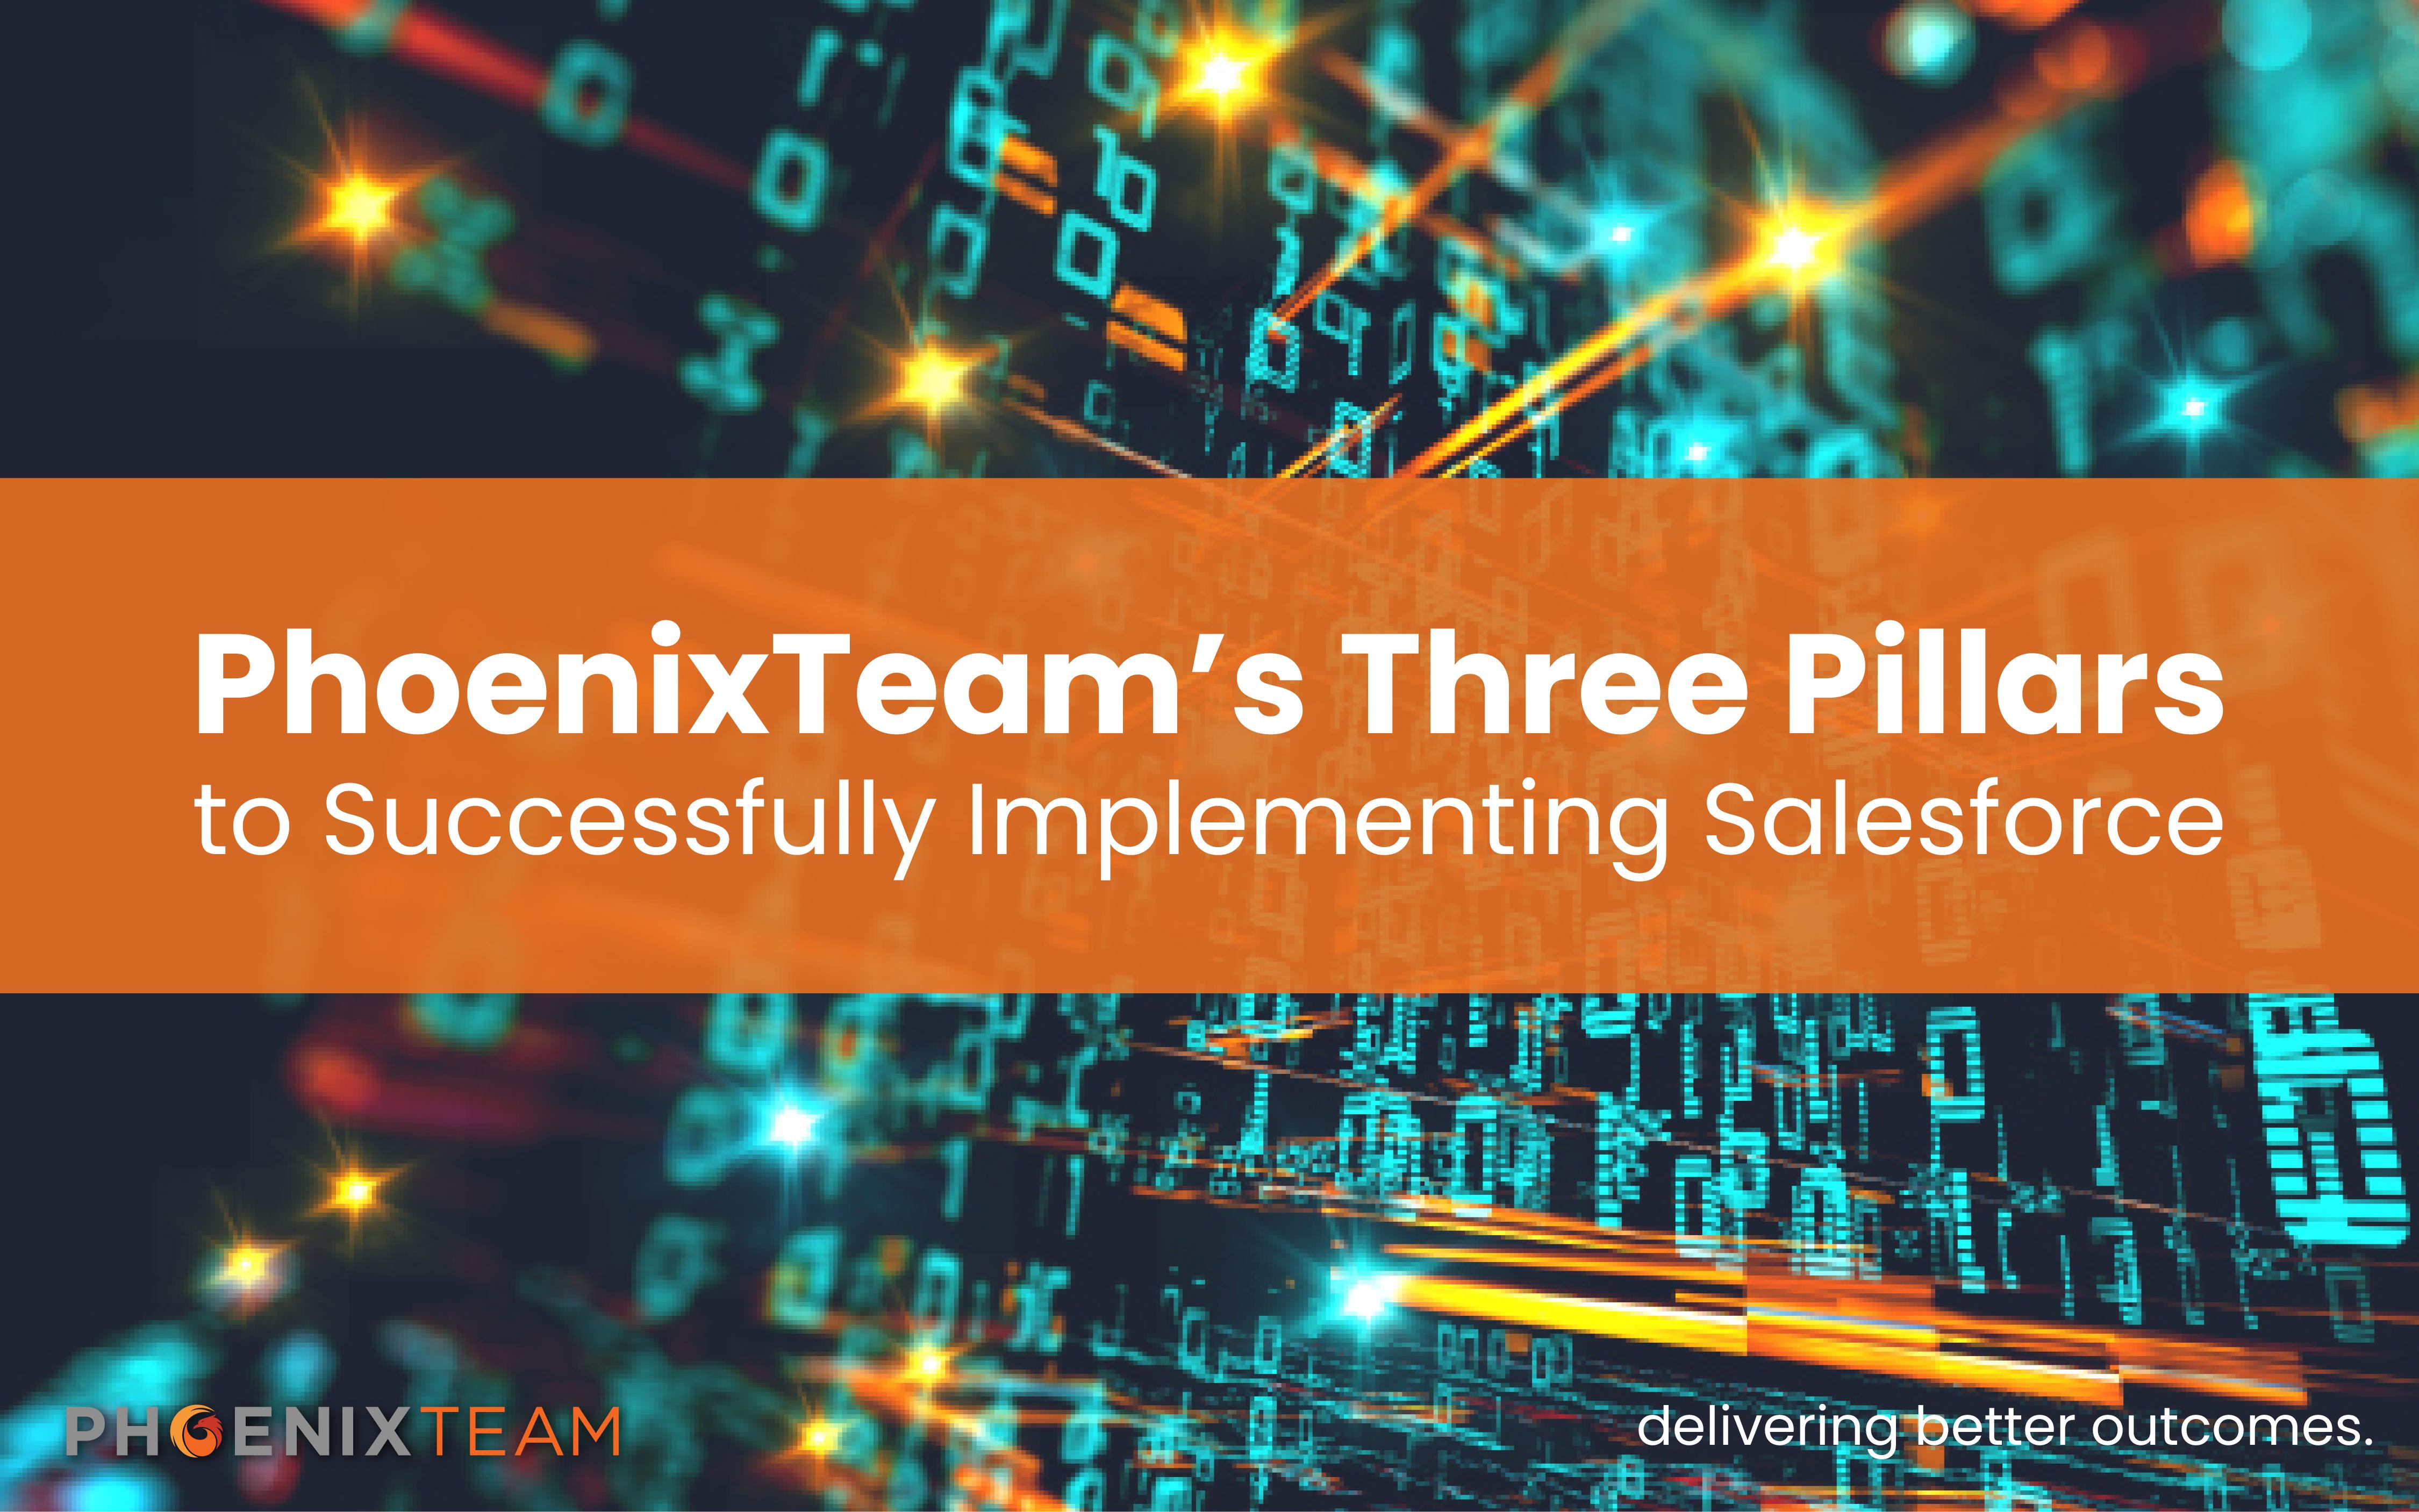 PhoenixTeam Salesforce Blog Image